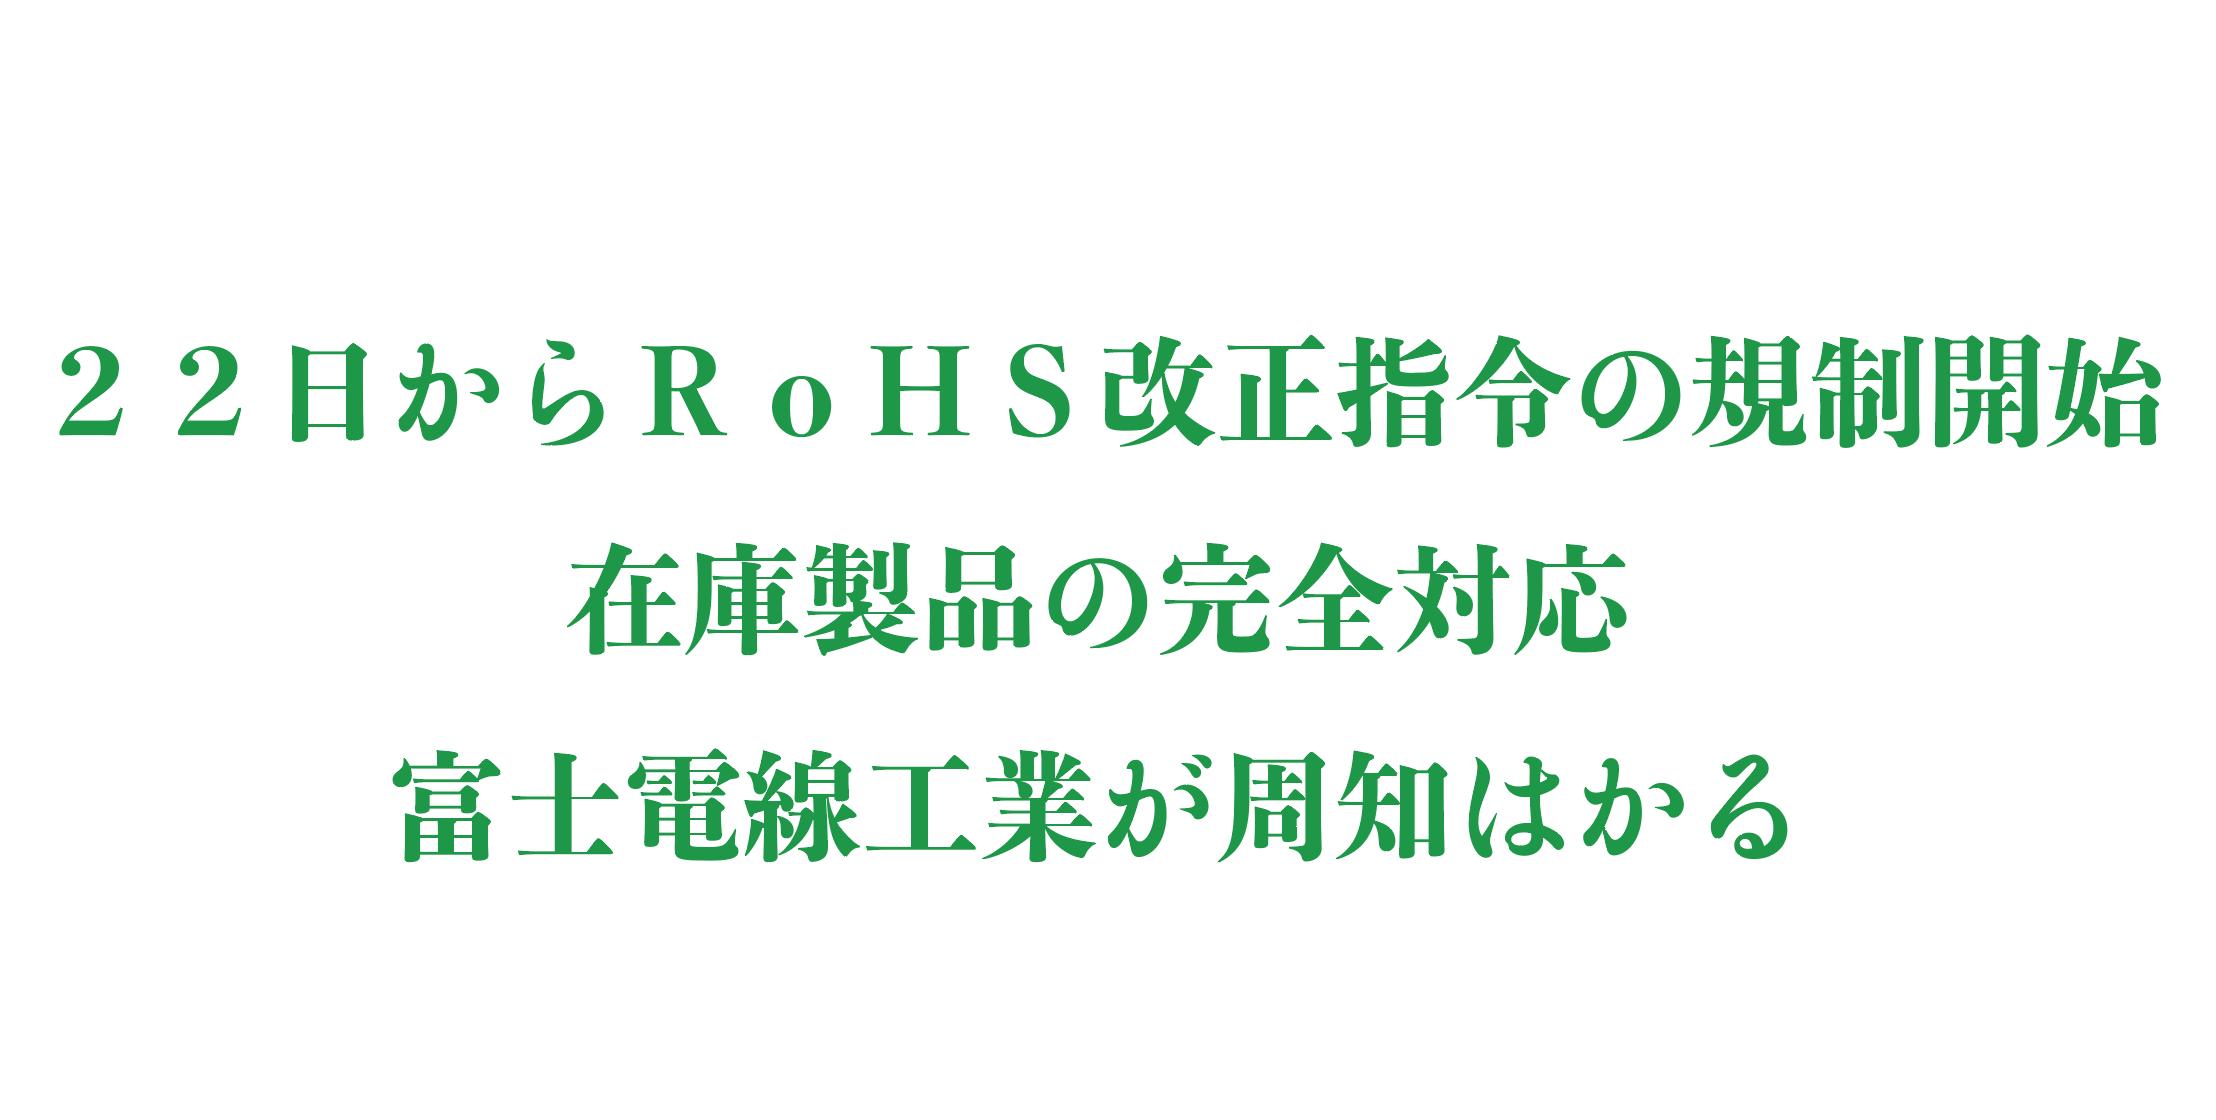 富士電線工業が周知 在庫製品の完全対応の画像